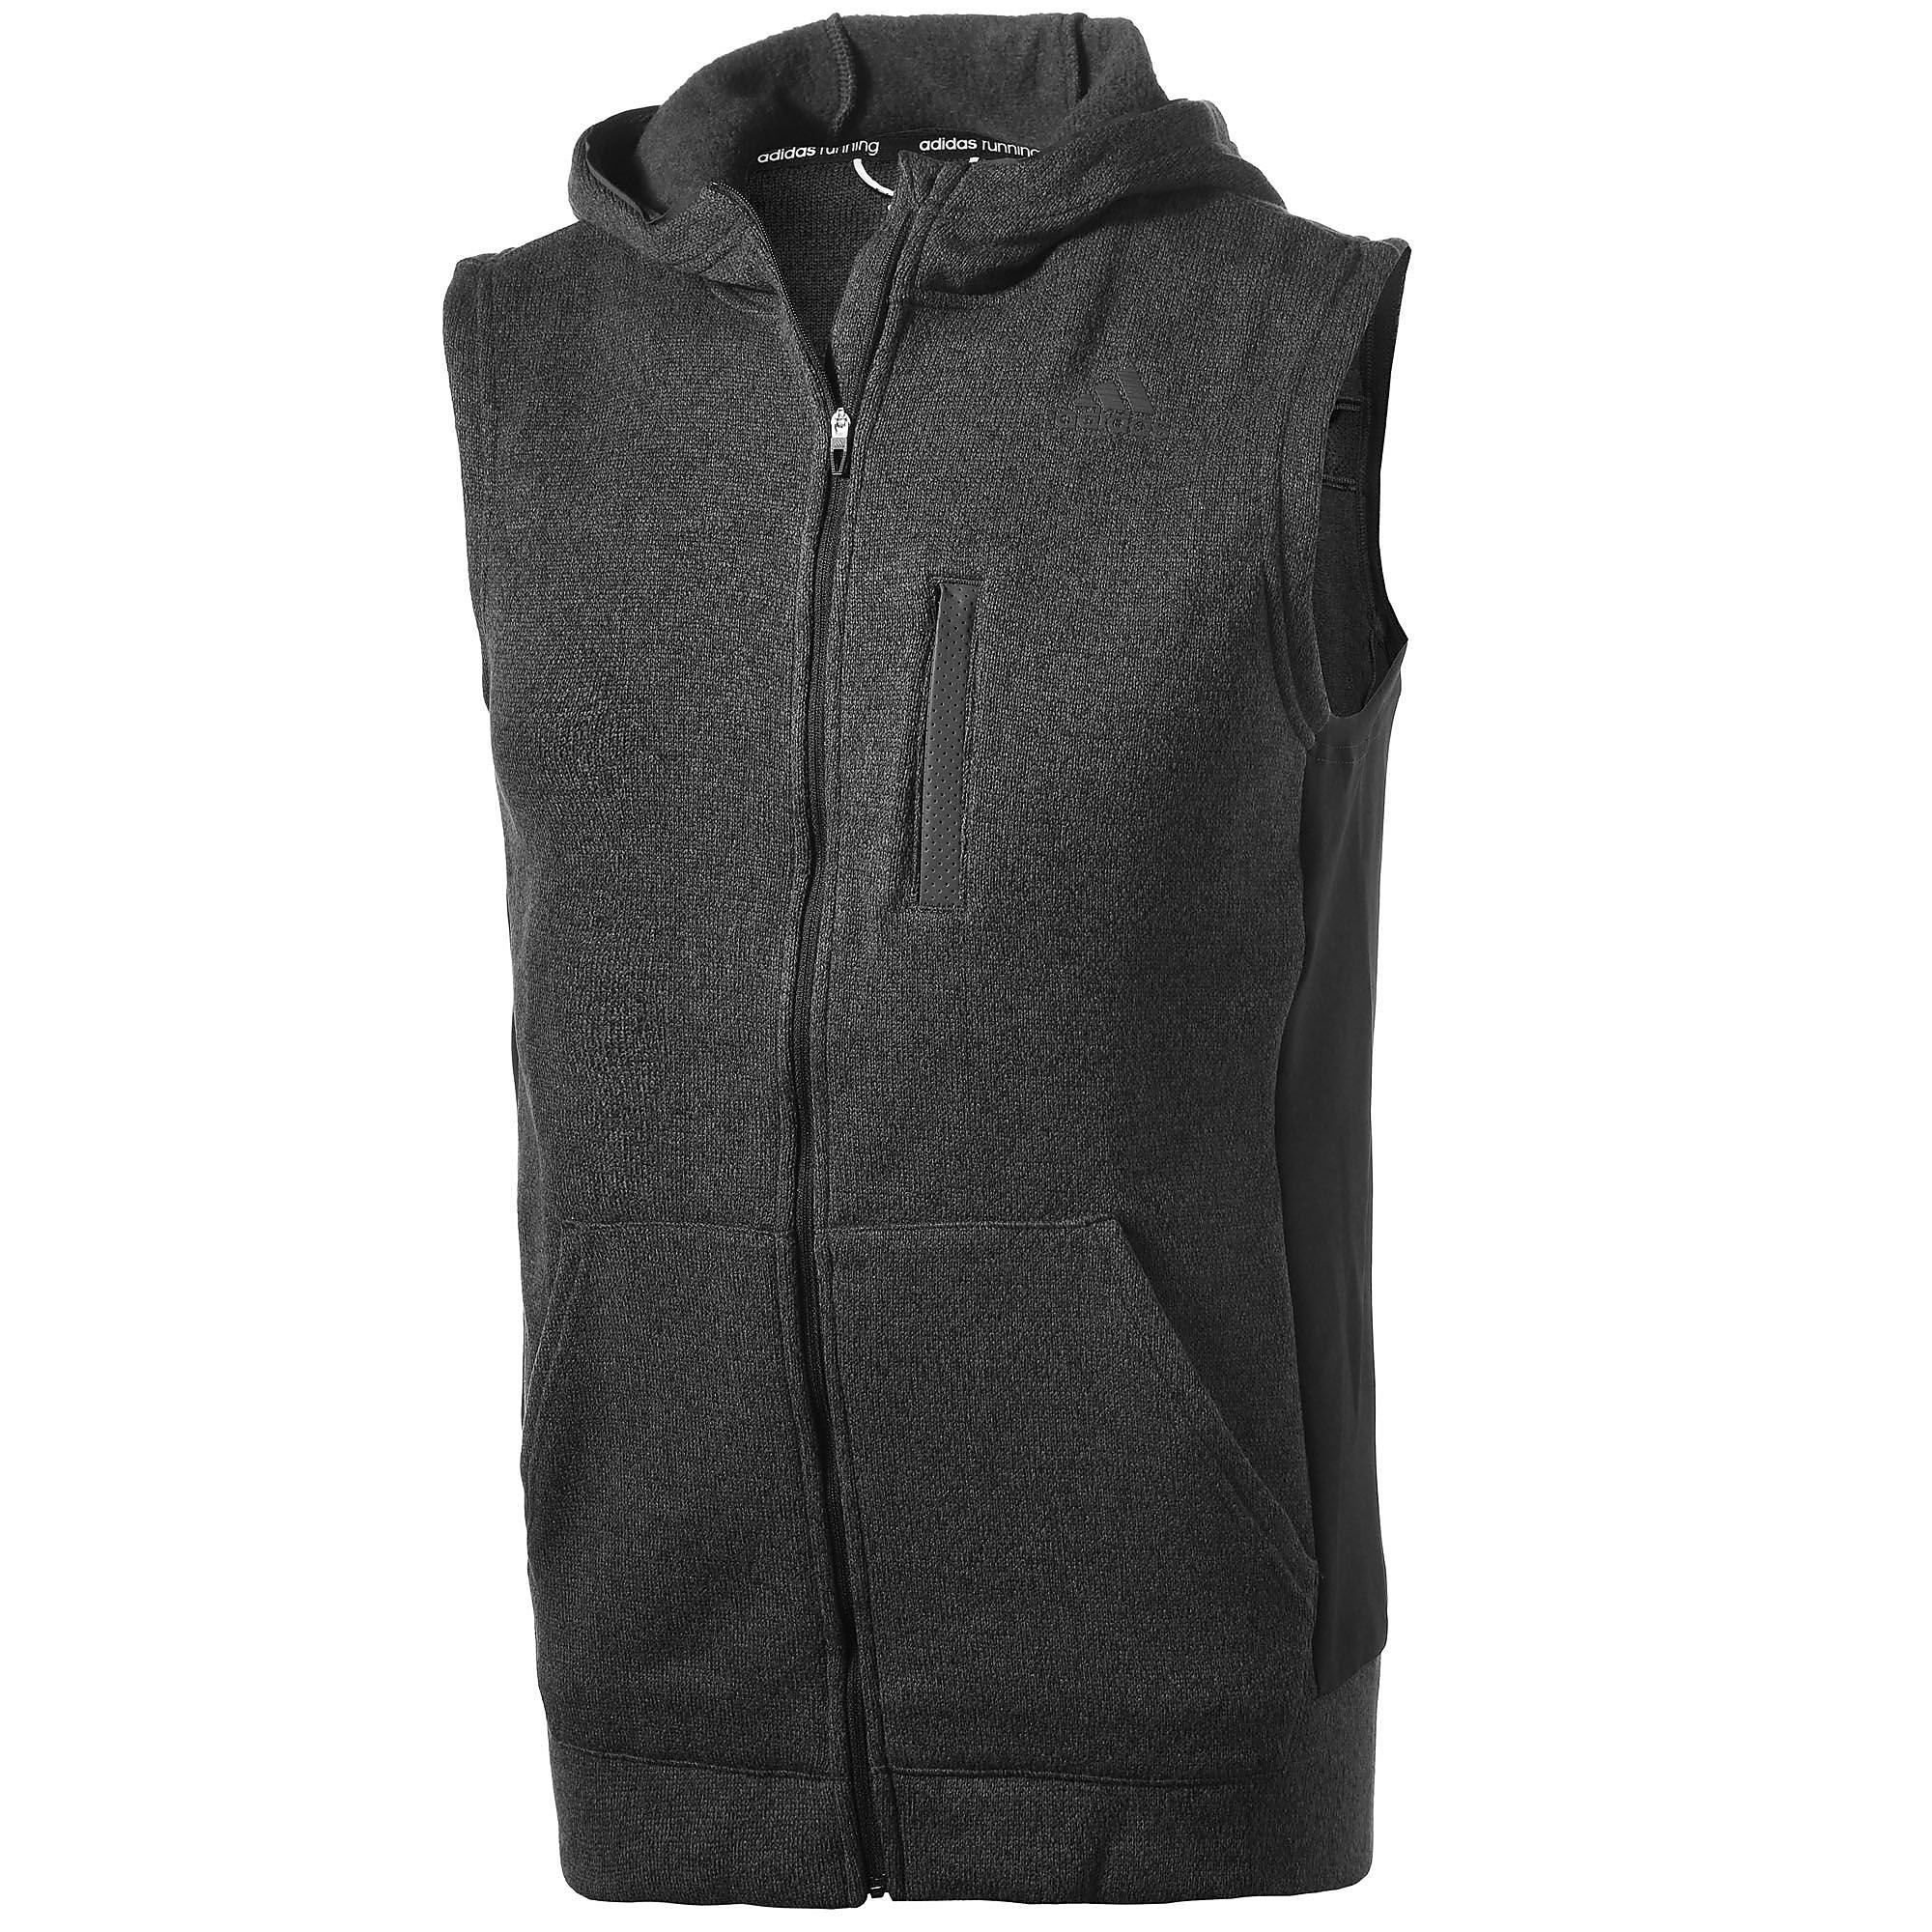 adidas Men's Ultimate Full Zip Running Vest Black S